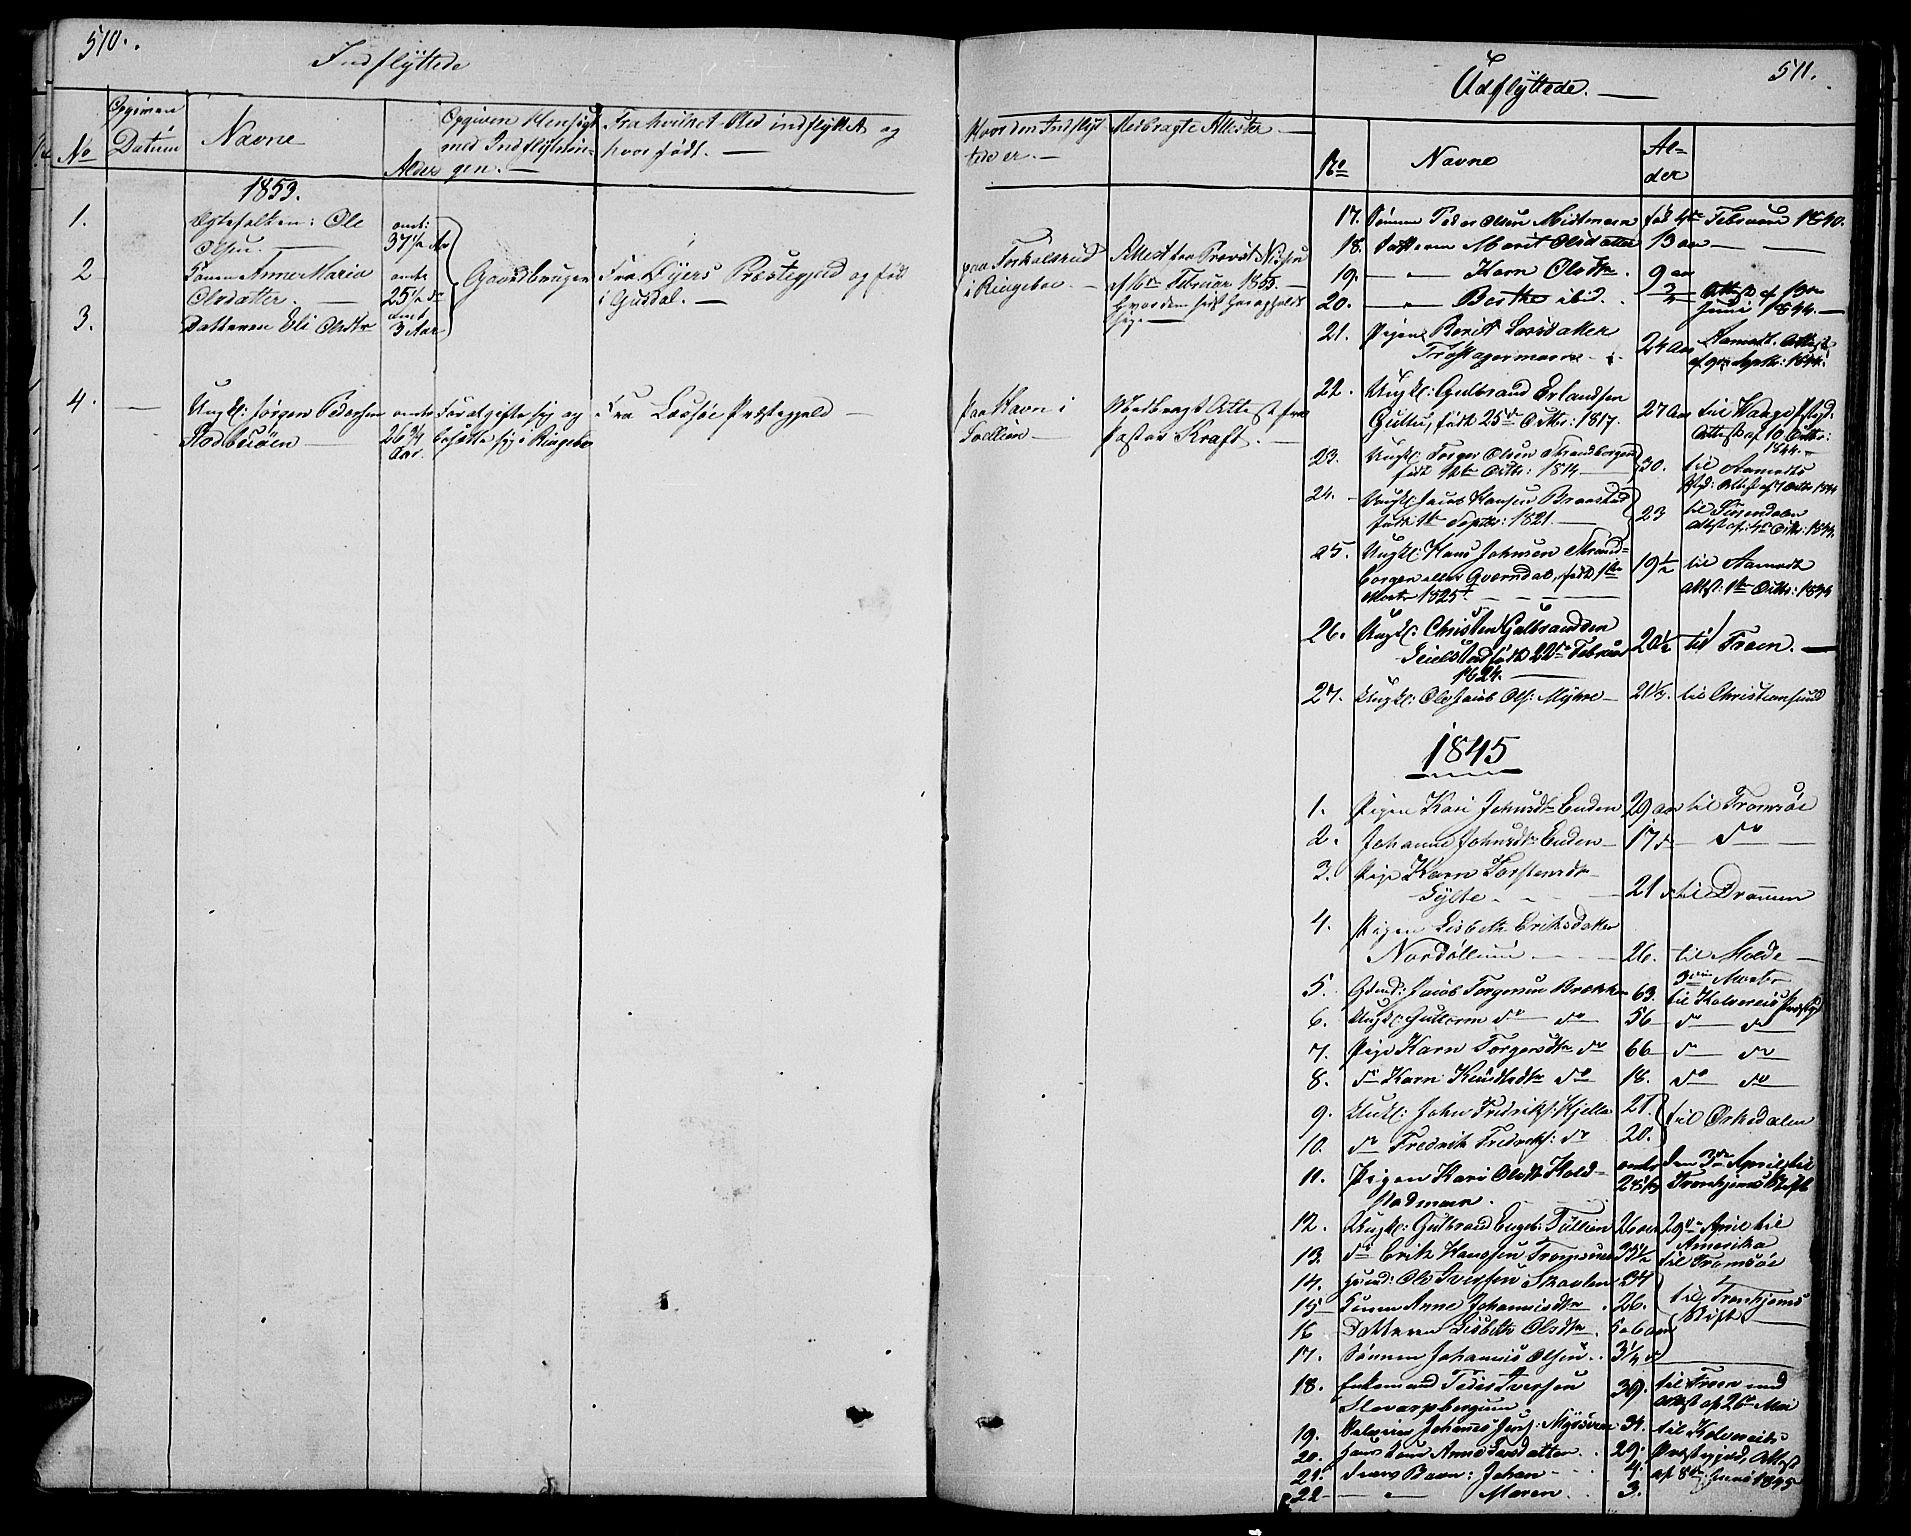 SAH, Ringebu prestekontor, Klokkerbok nr. 2, 1839-1853, s. 510-511